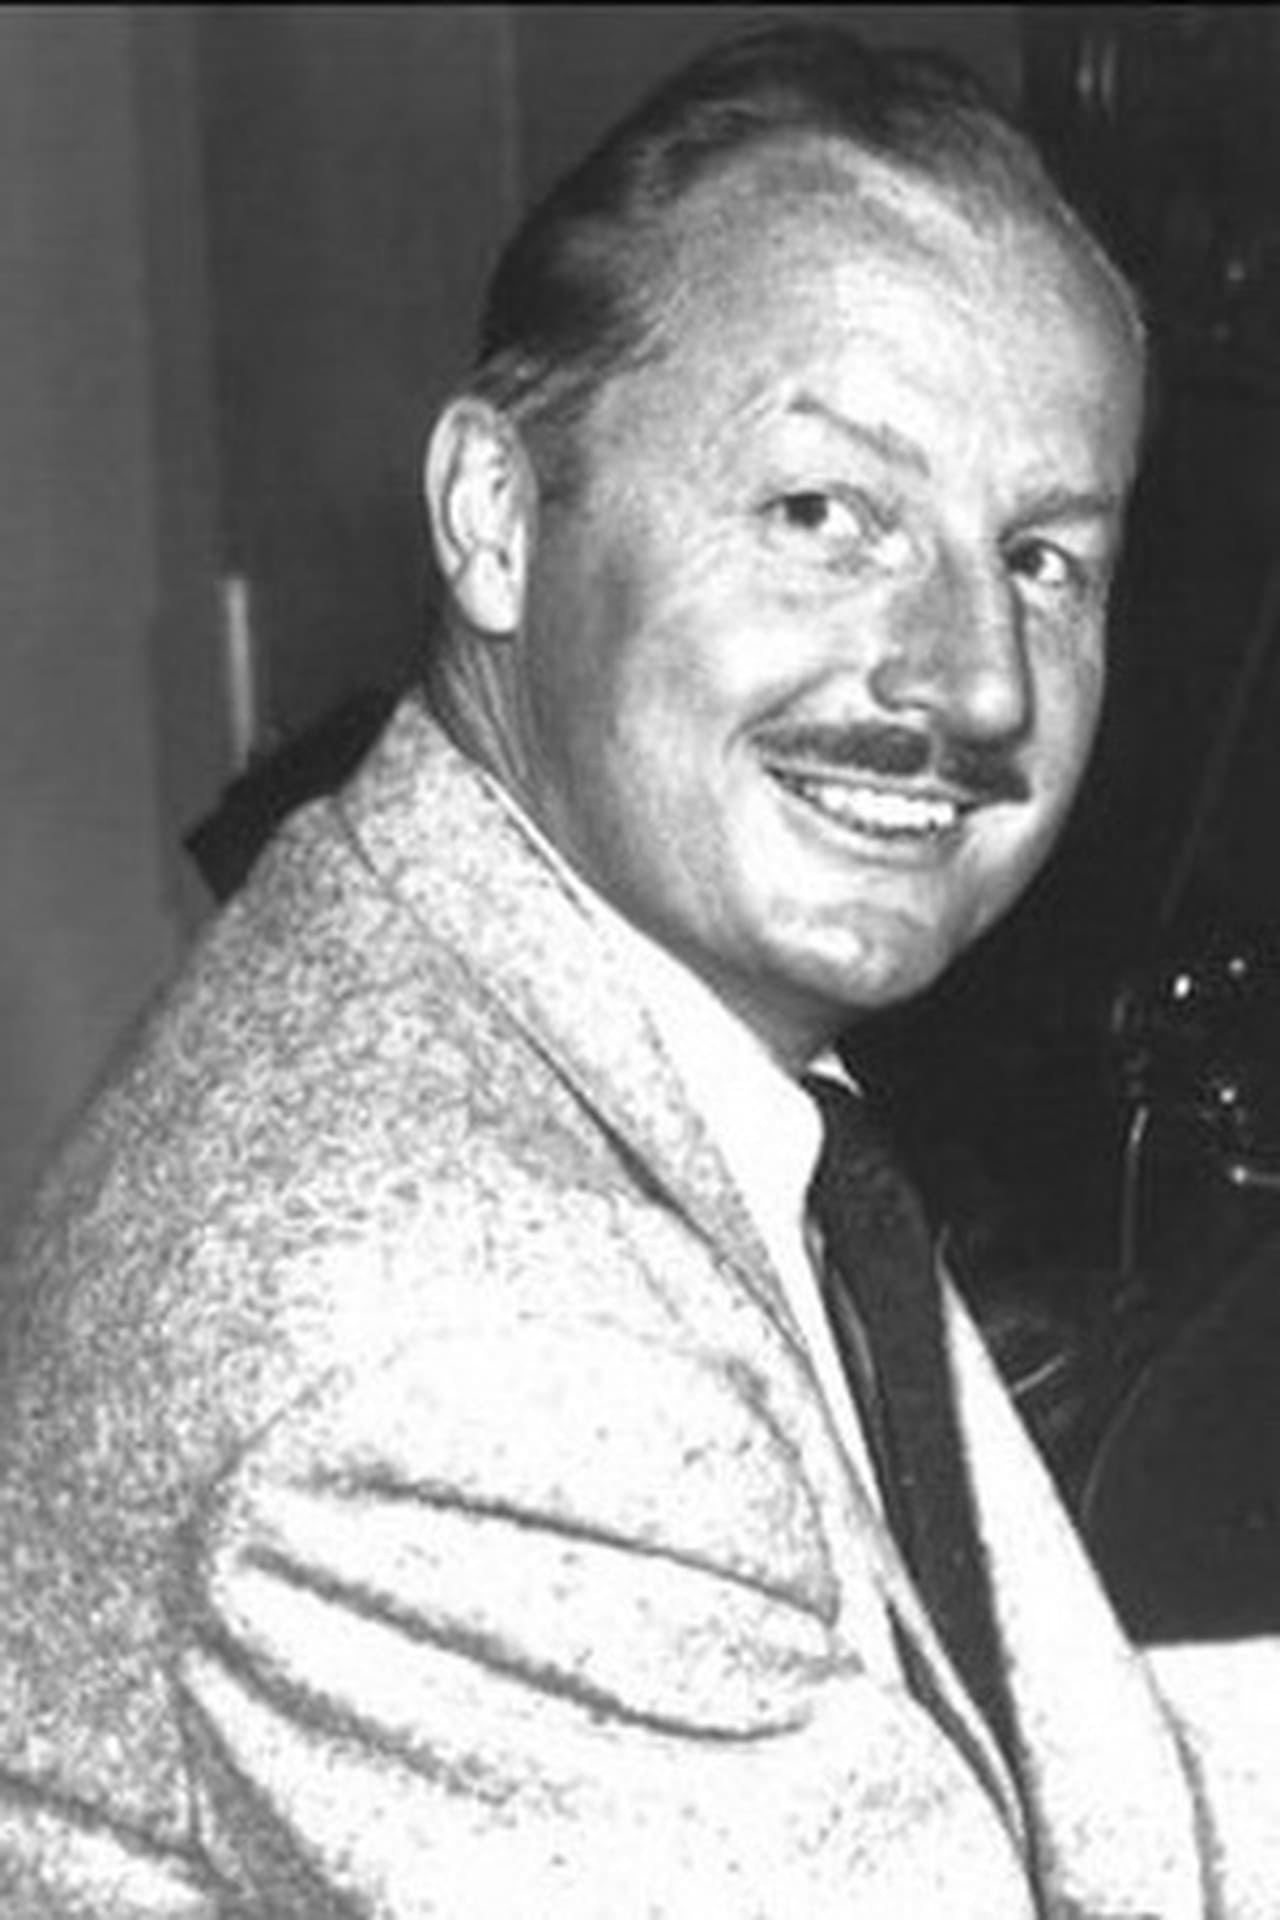 James Algar